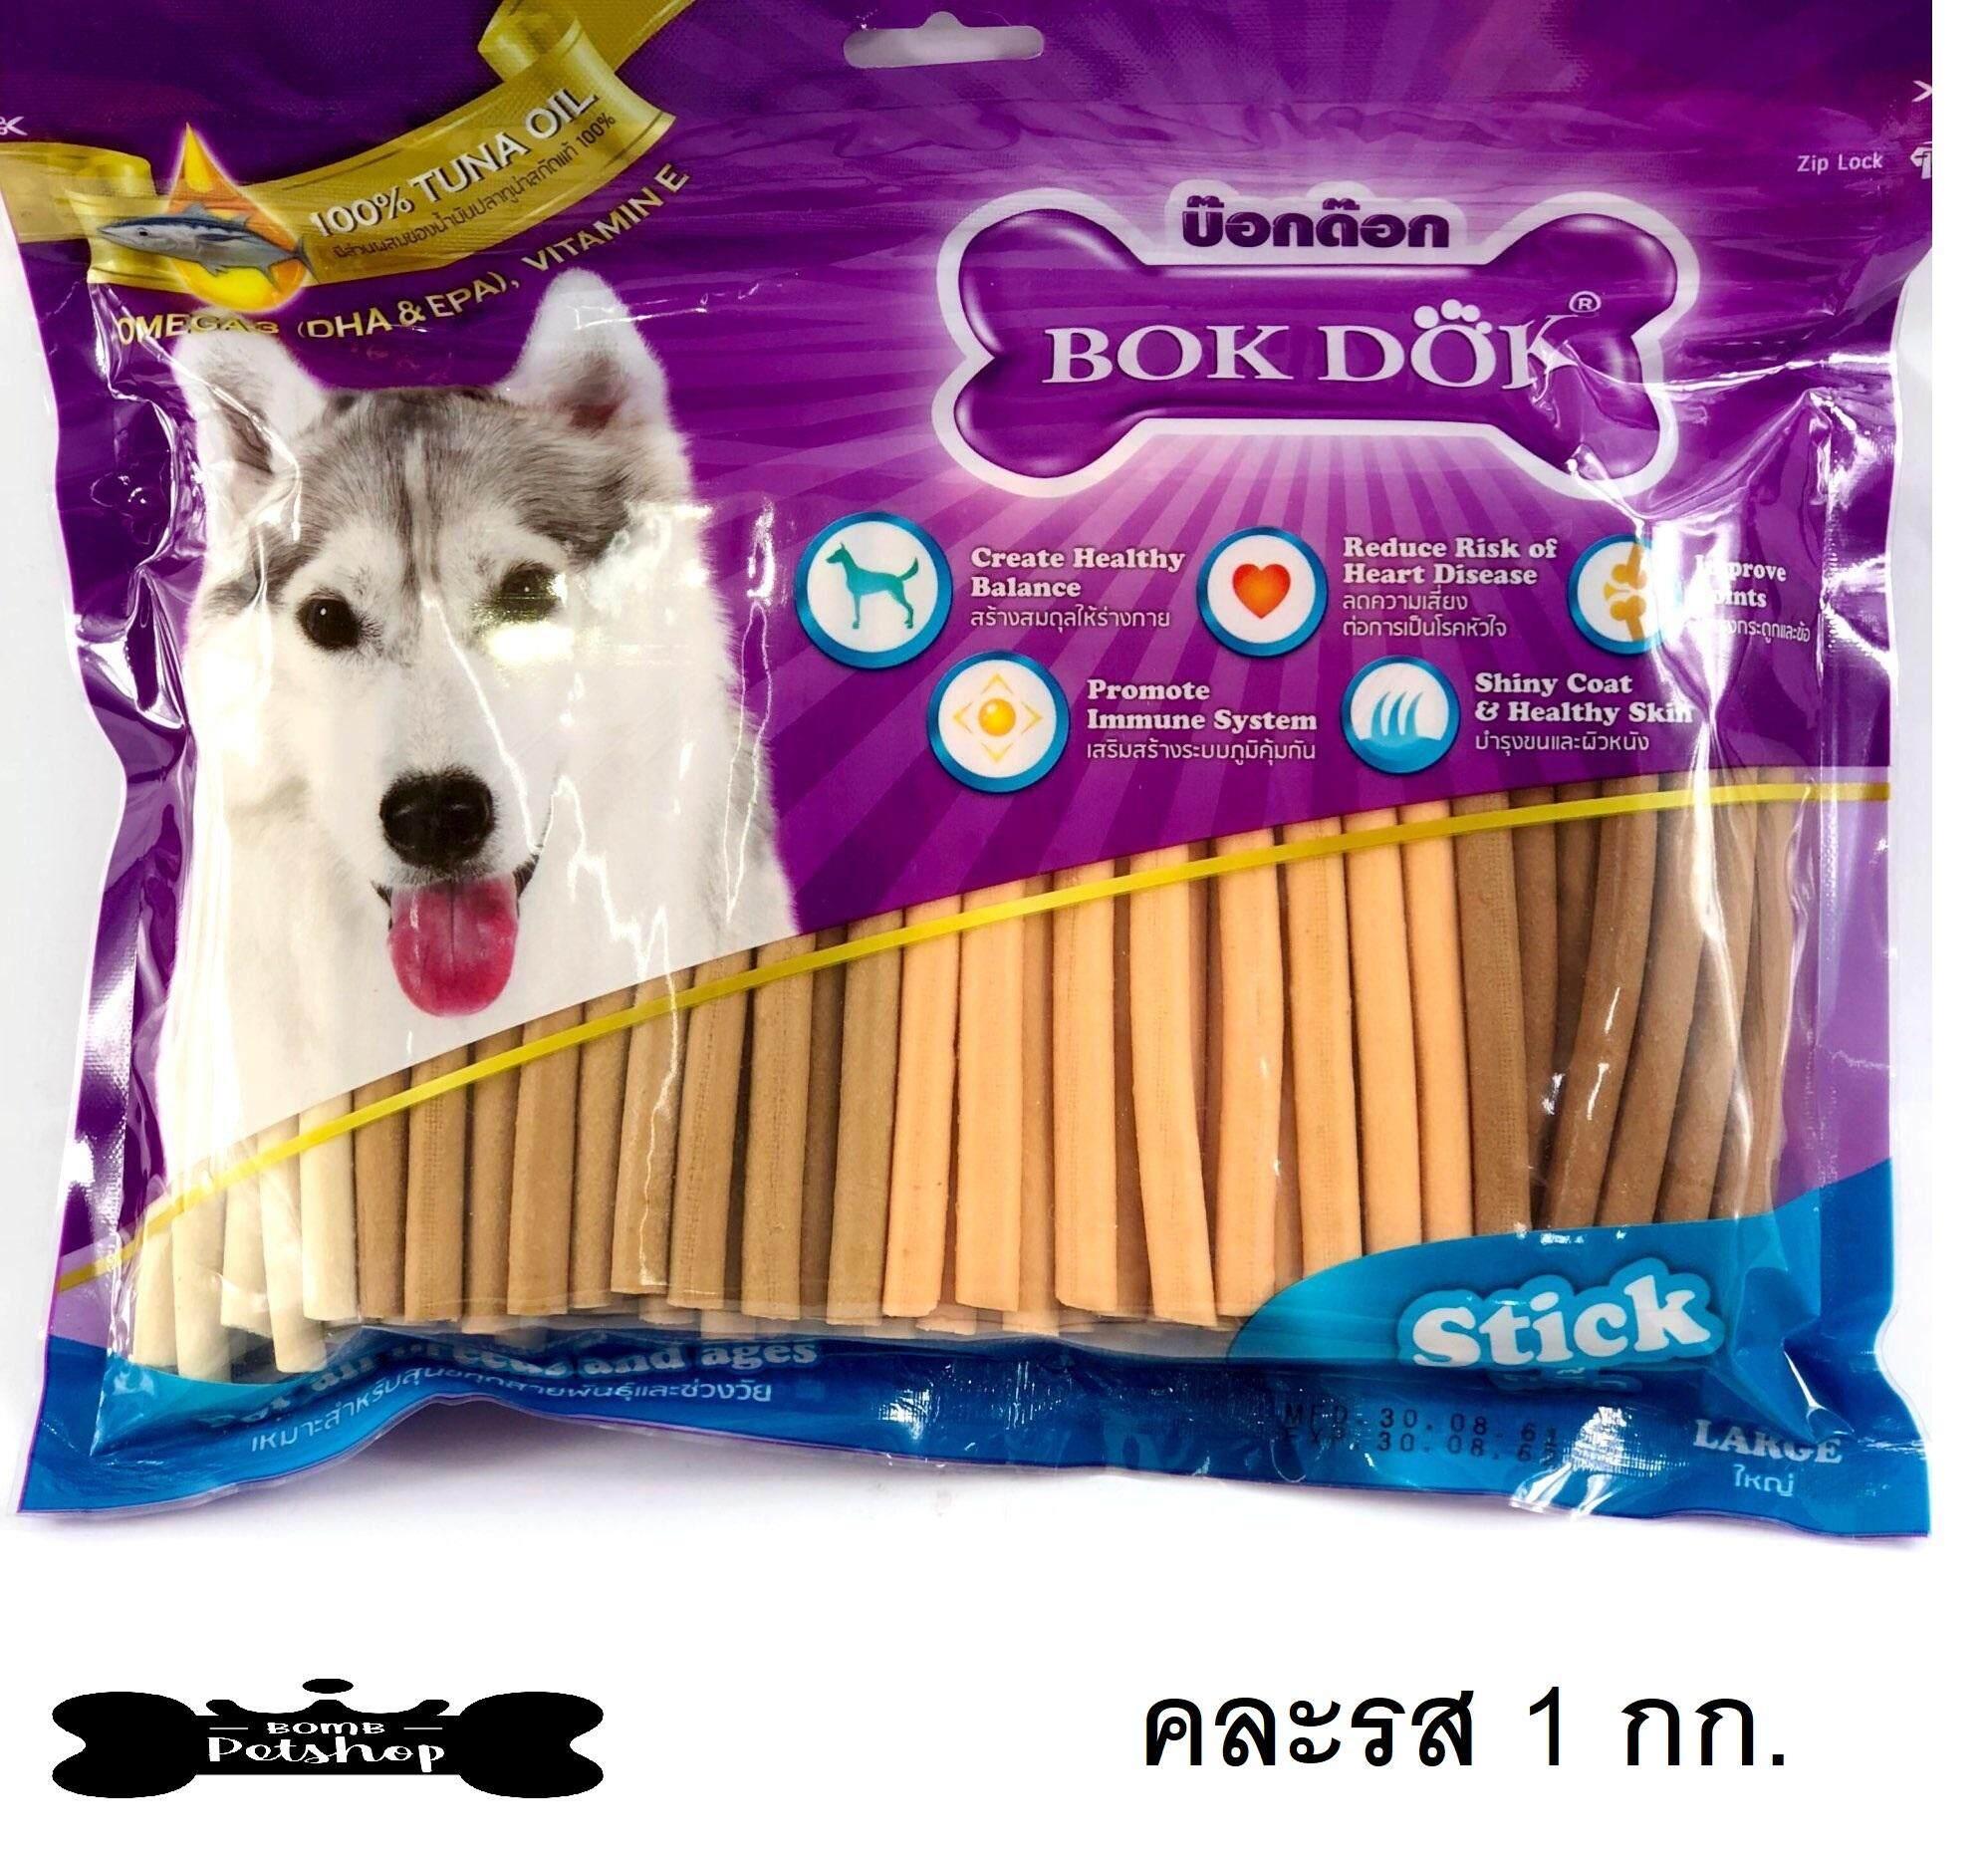 Bokdok Stick ขนมสุนัข ชิกเก้นสติก 5 รวมรส 1kg By Bomb Petshop.